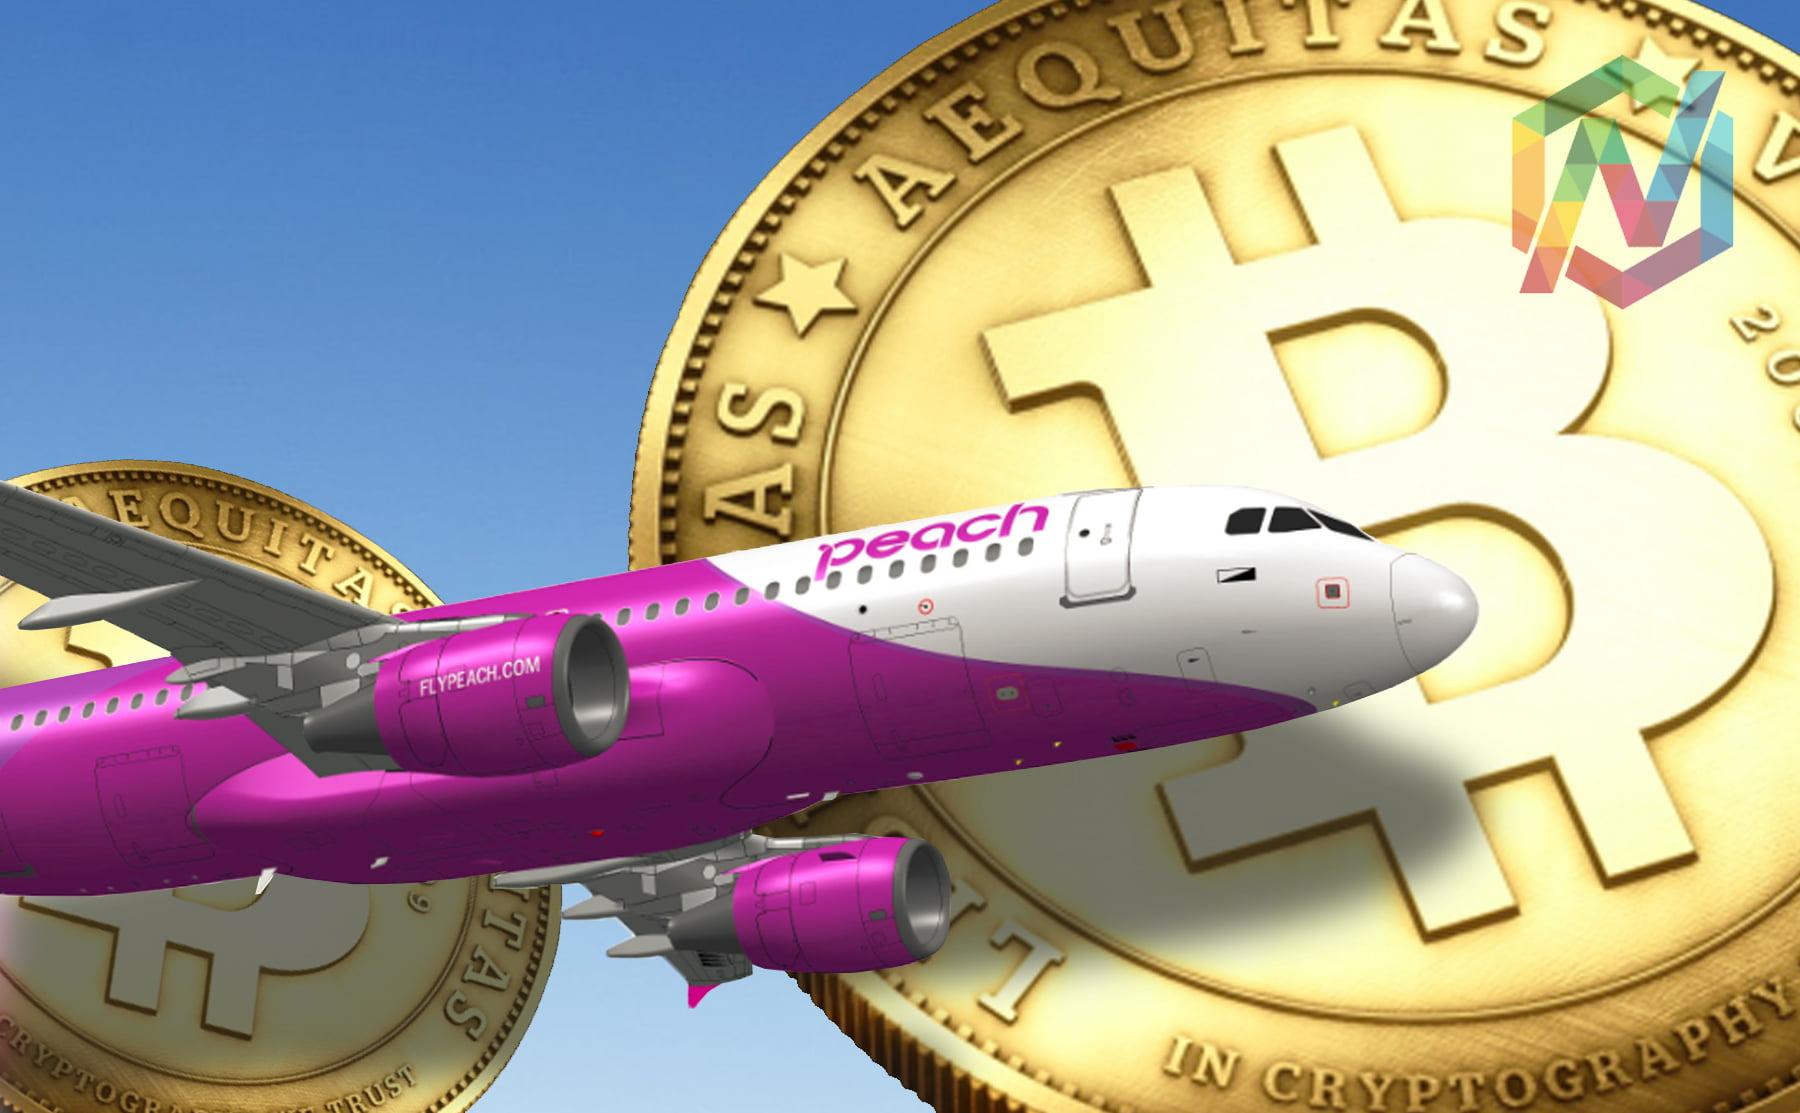 peach aviation, bitcoin, japan